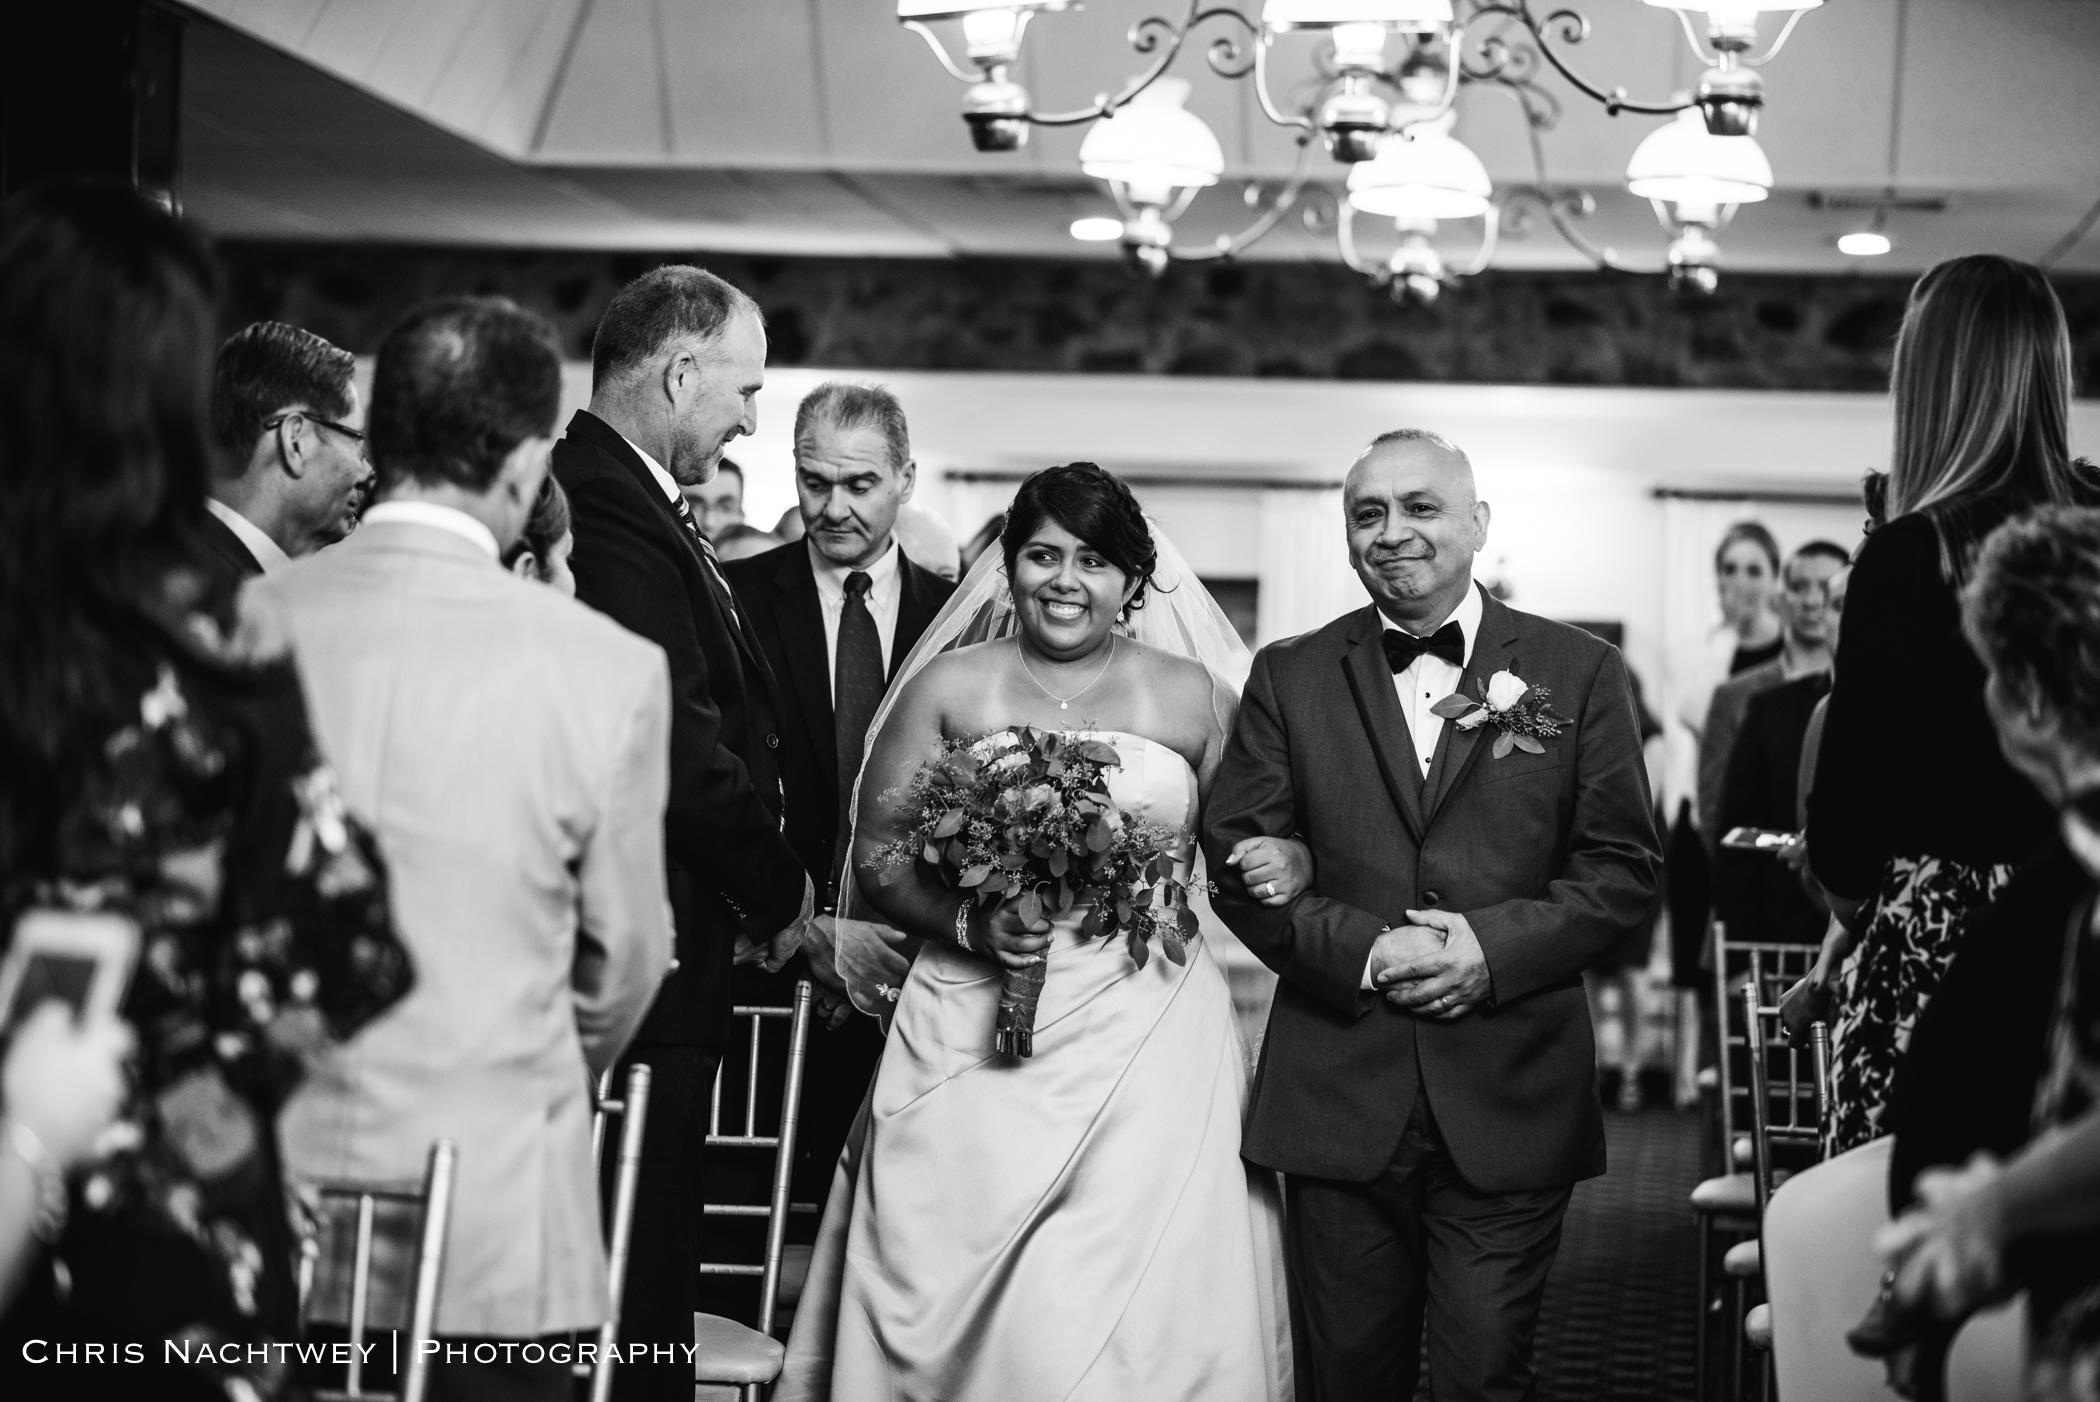 connecticut-same-sex-wedding-photographers-chris-nachtwey-2018-lisa-karina-16.jpg